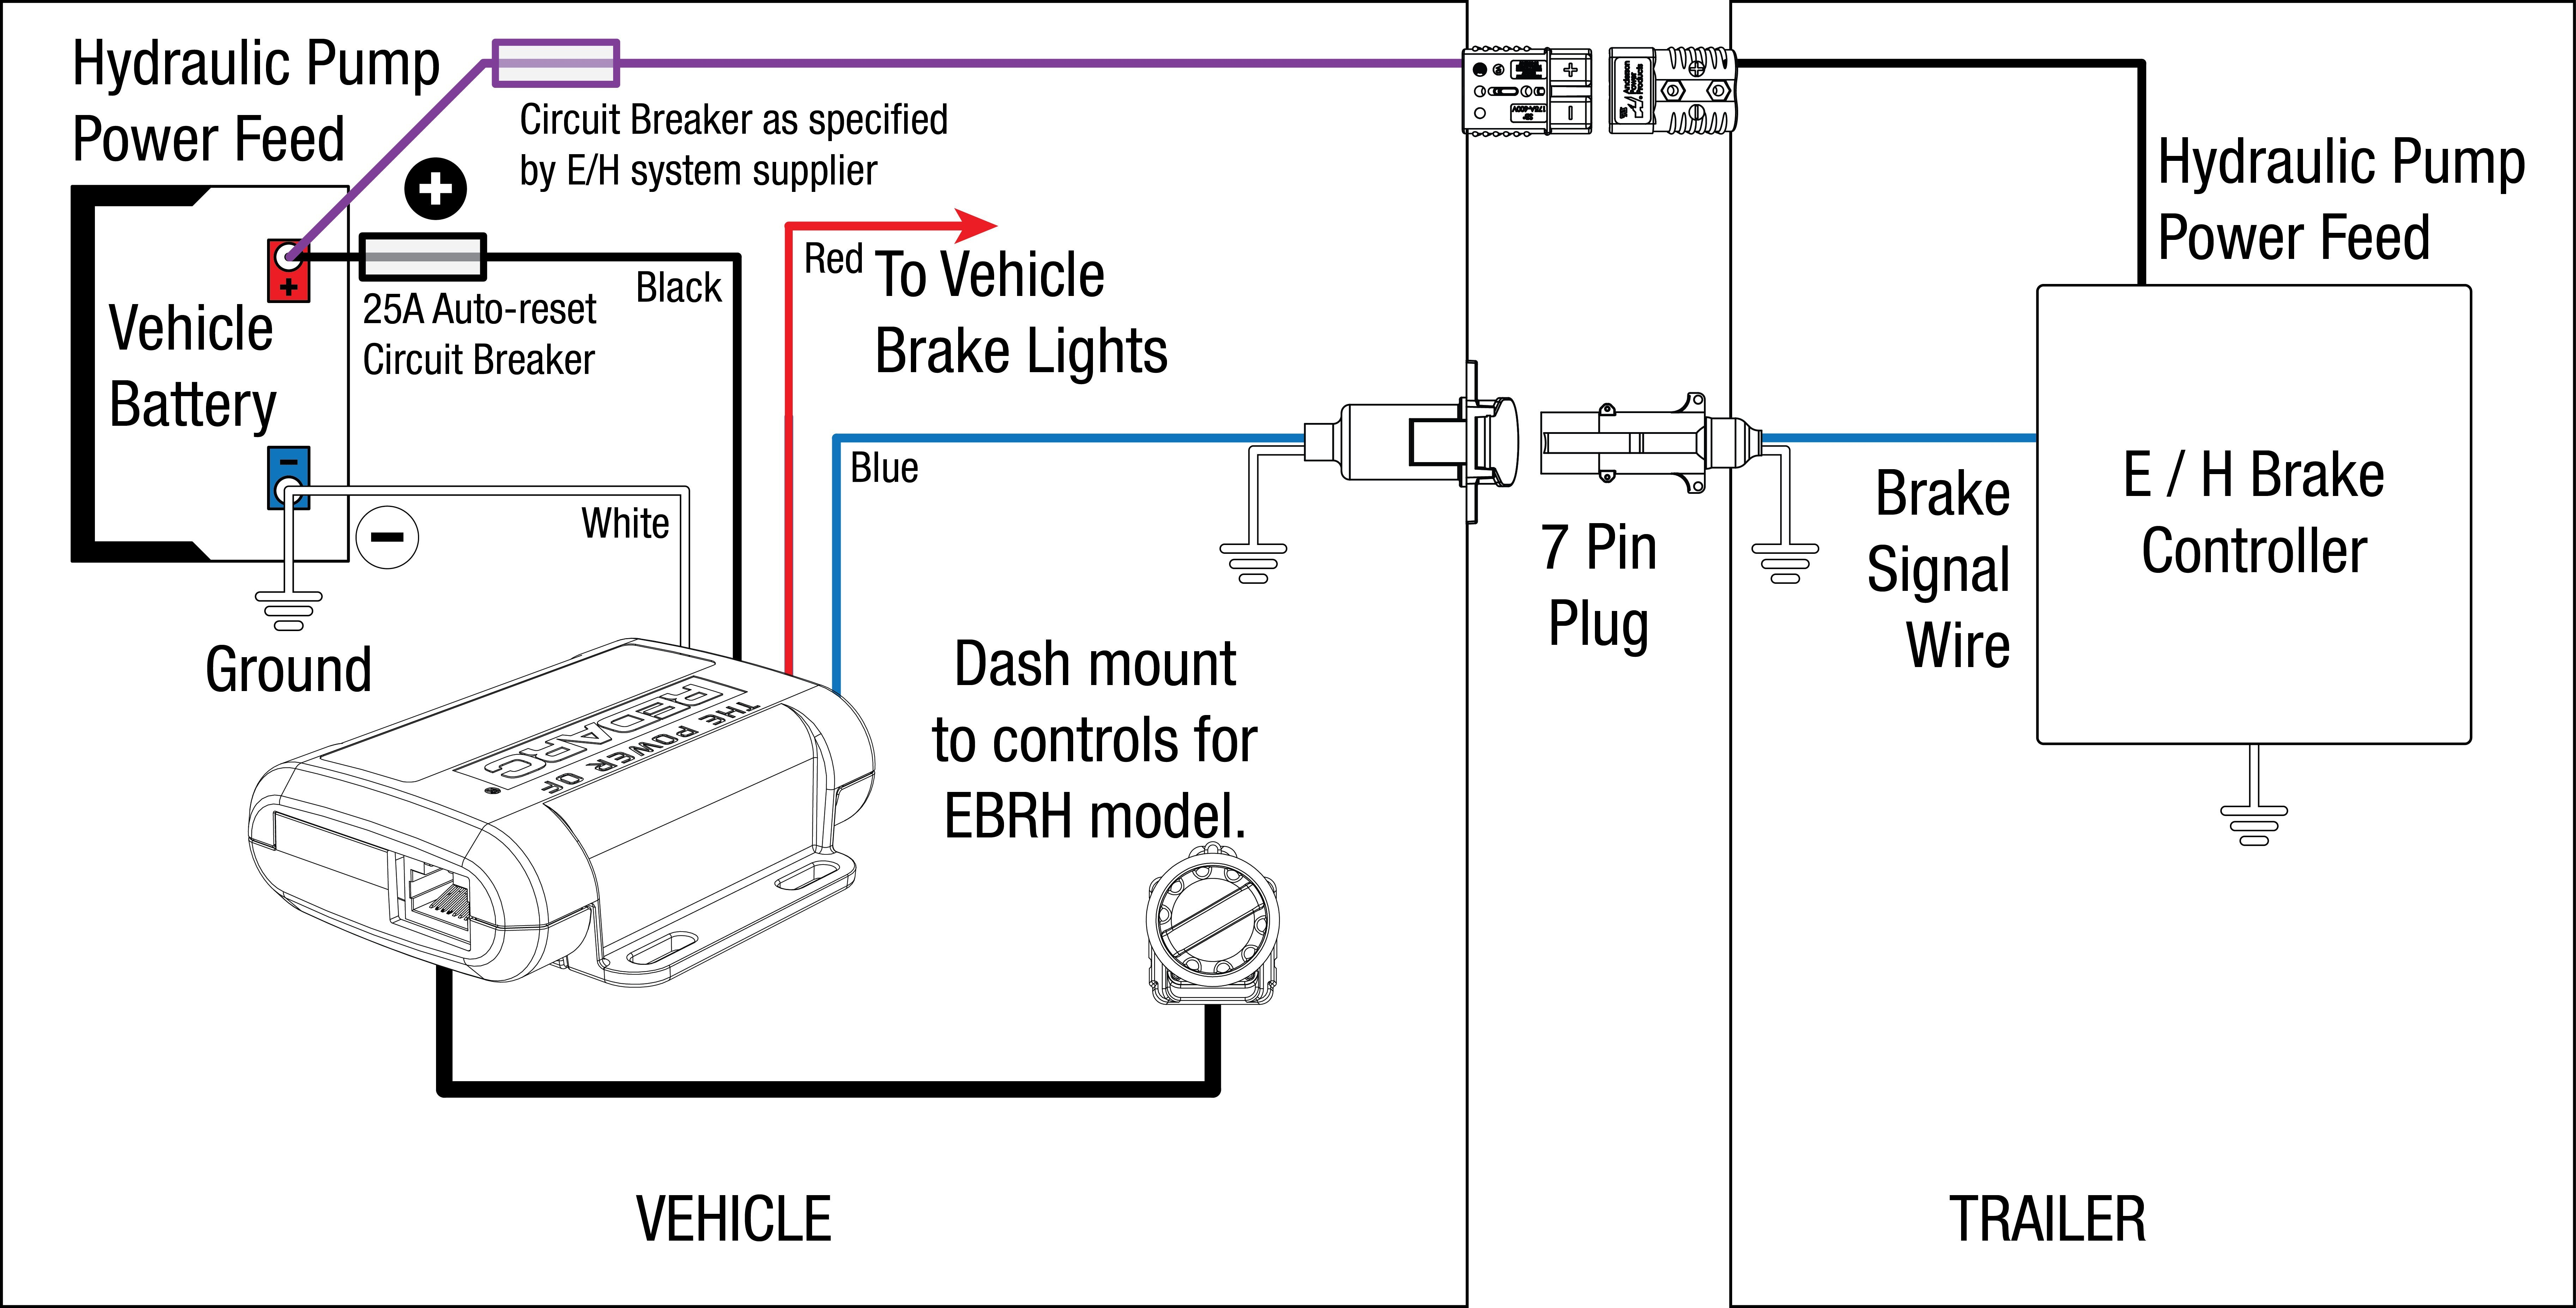 Enclosed Trailer Wiring Diagram Wiring Likewise Enclosed Trailer Wiring Diagram to Her with Of Enclosed Trailer Wiring Diagram